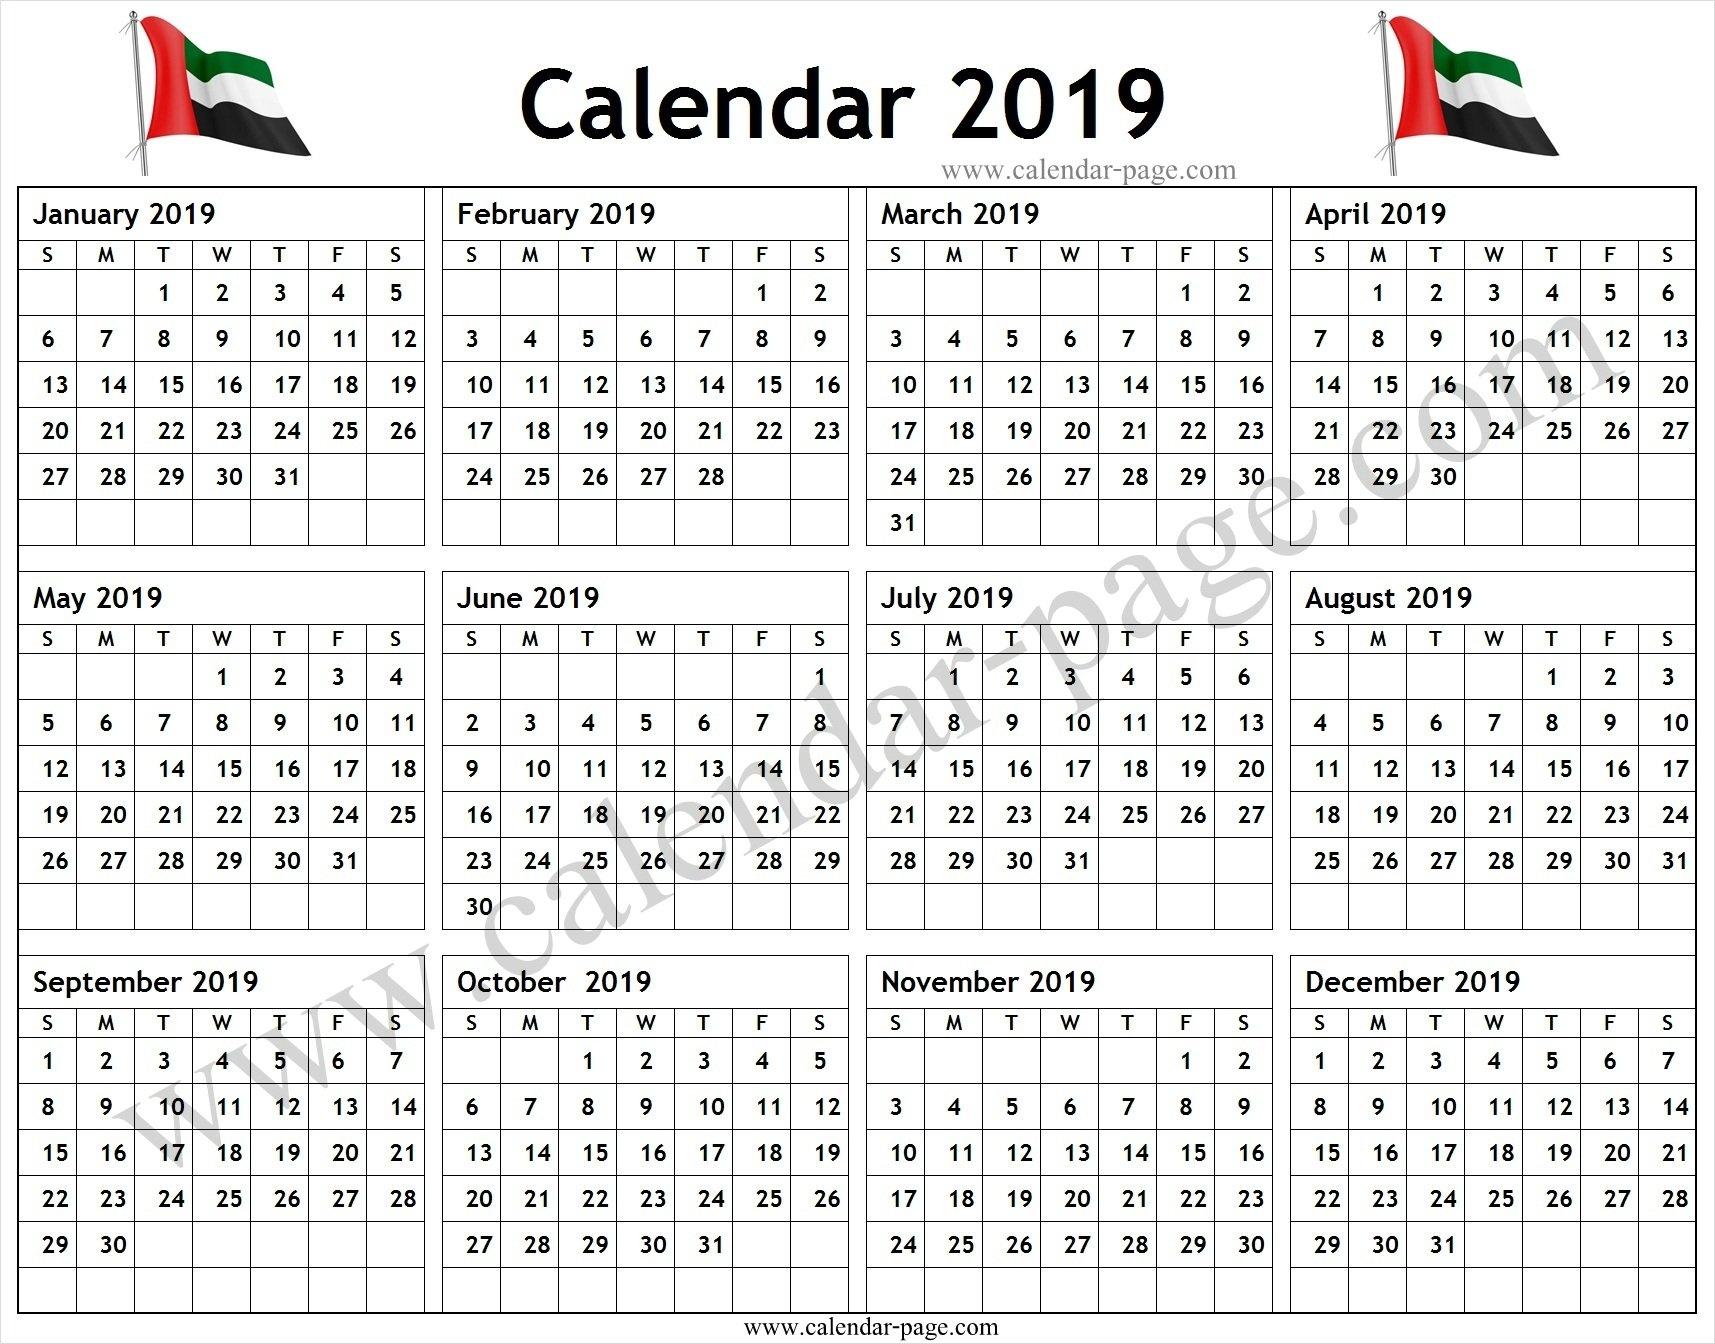 Calendar 2019 Uae Pdf – Blank Calendar 2019 Template U A E Calendar 2019